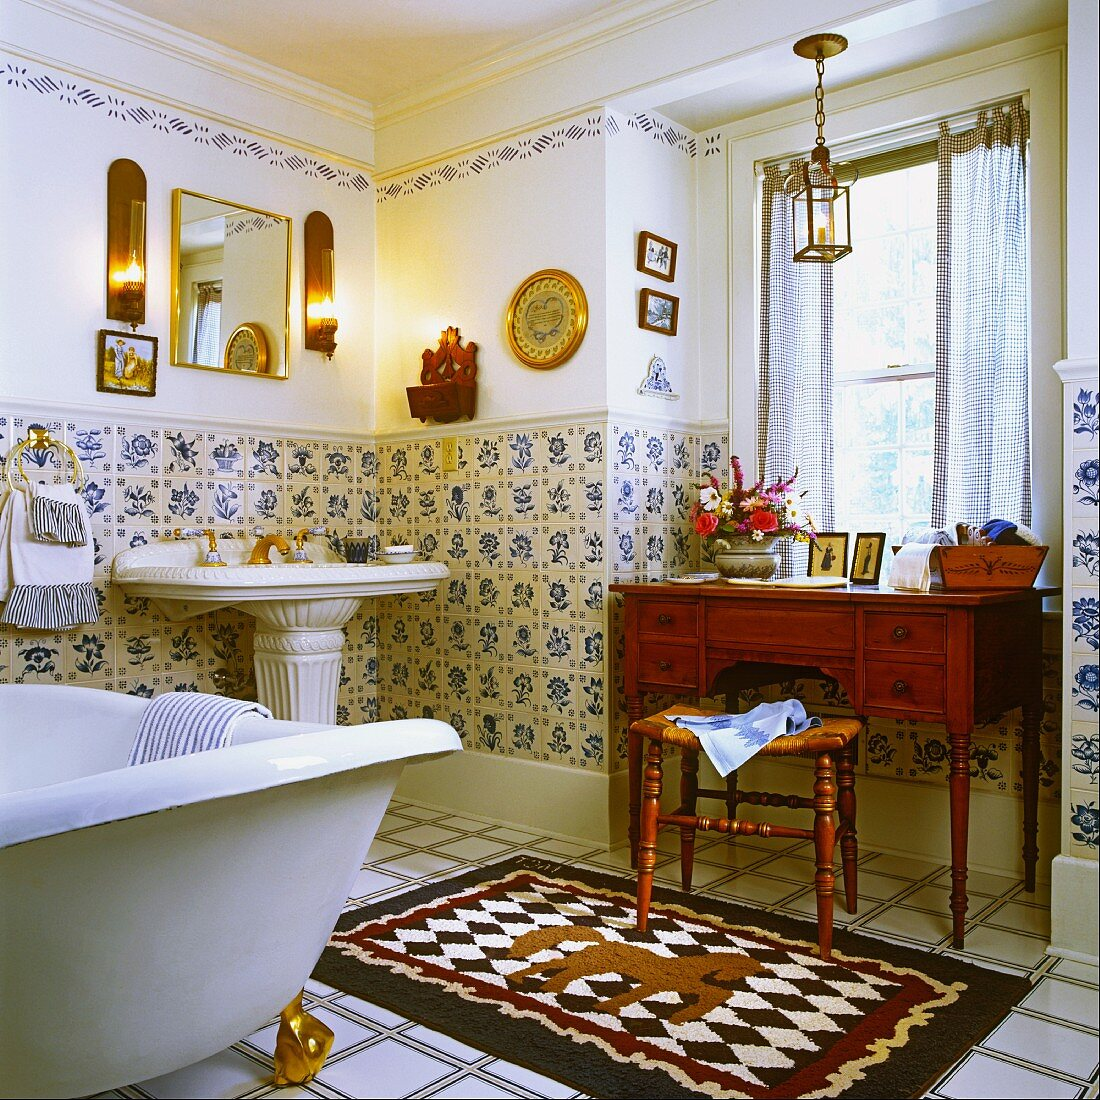 Nostalgic Bathroom With Antique Buy Image 11093677 Living4media